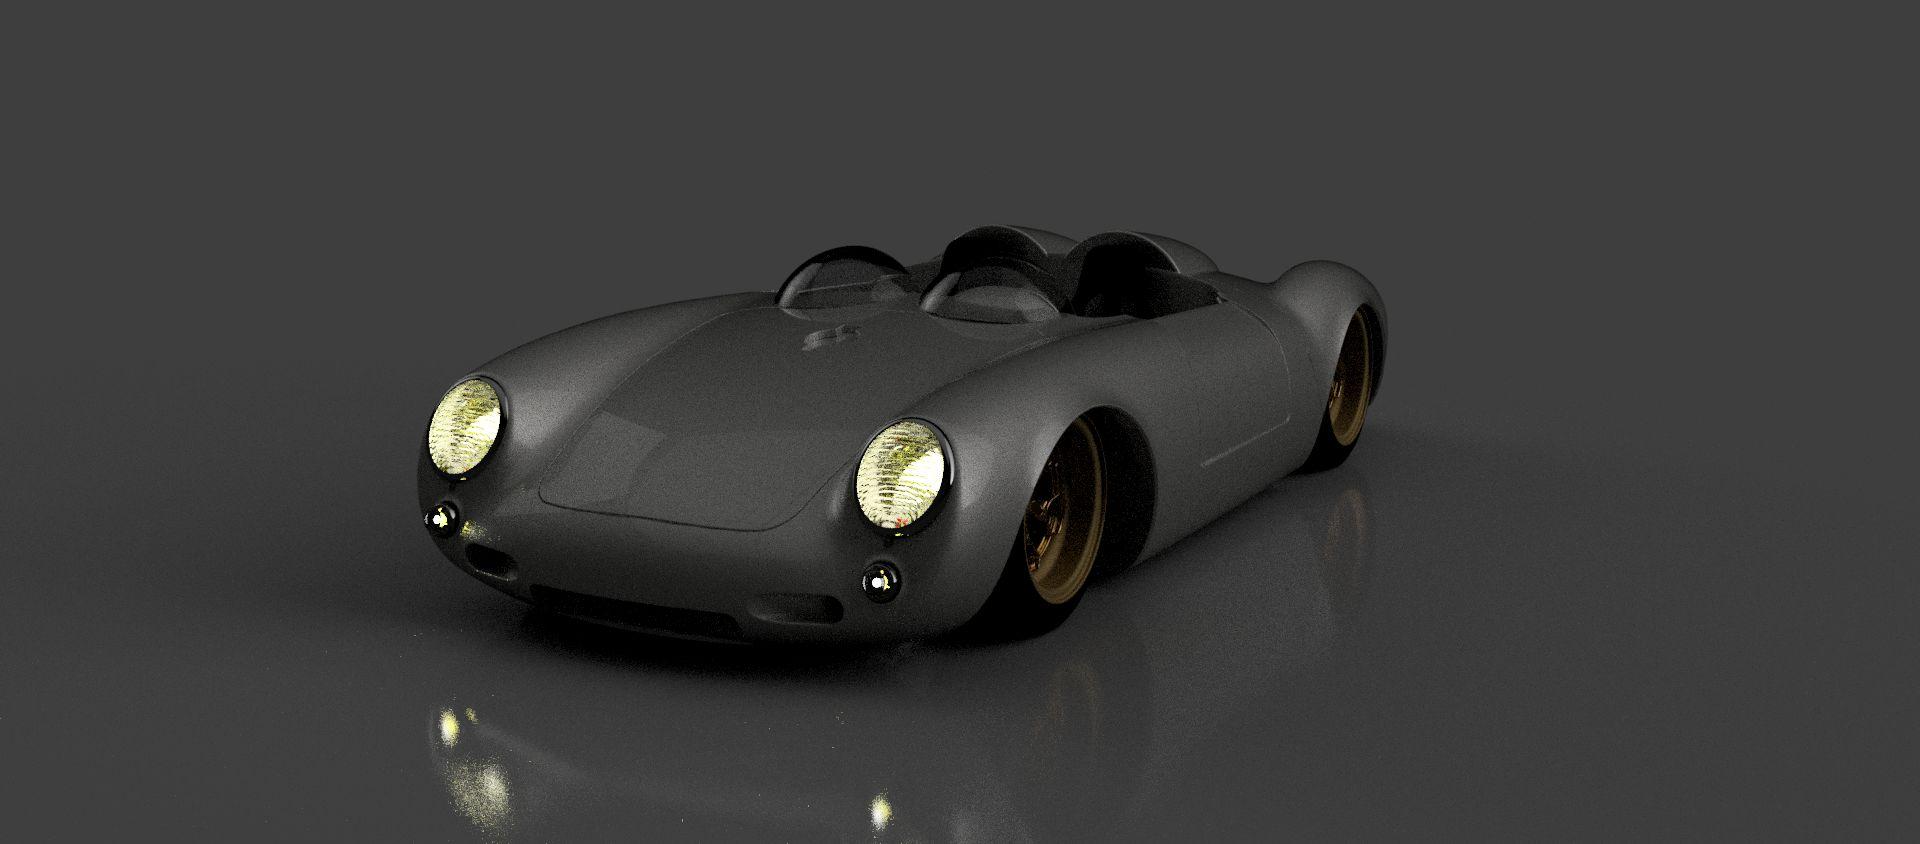 Porsche-550-spyder-v5-3500-3500